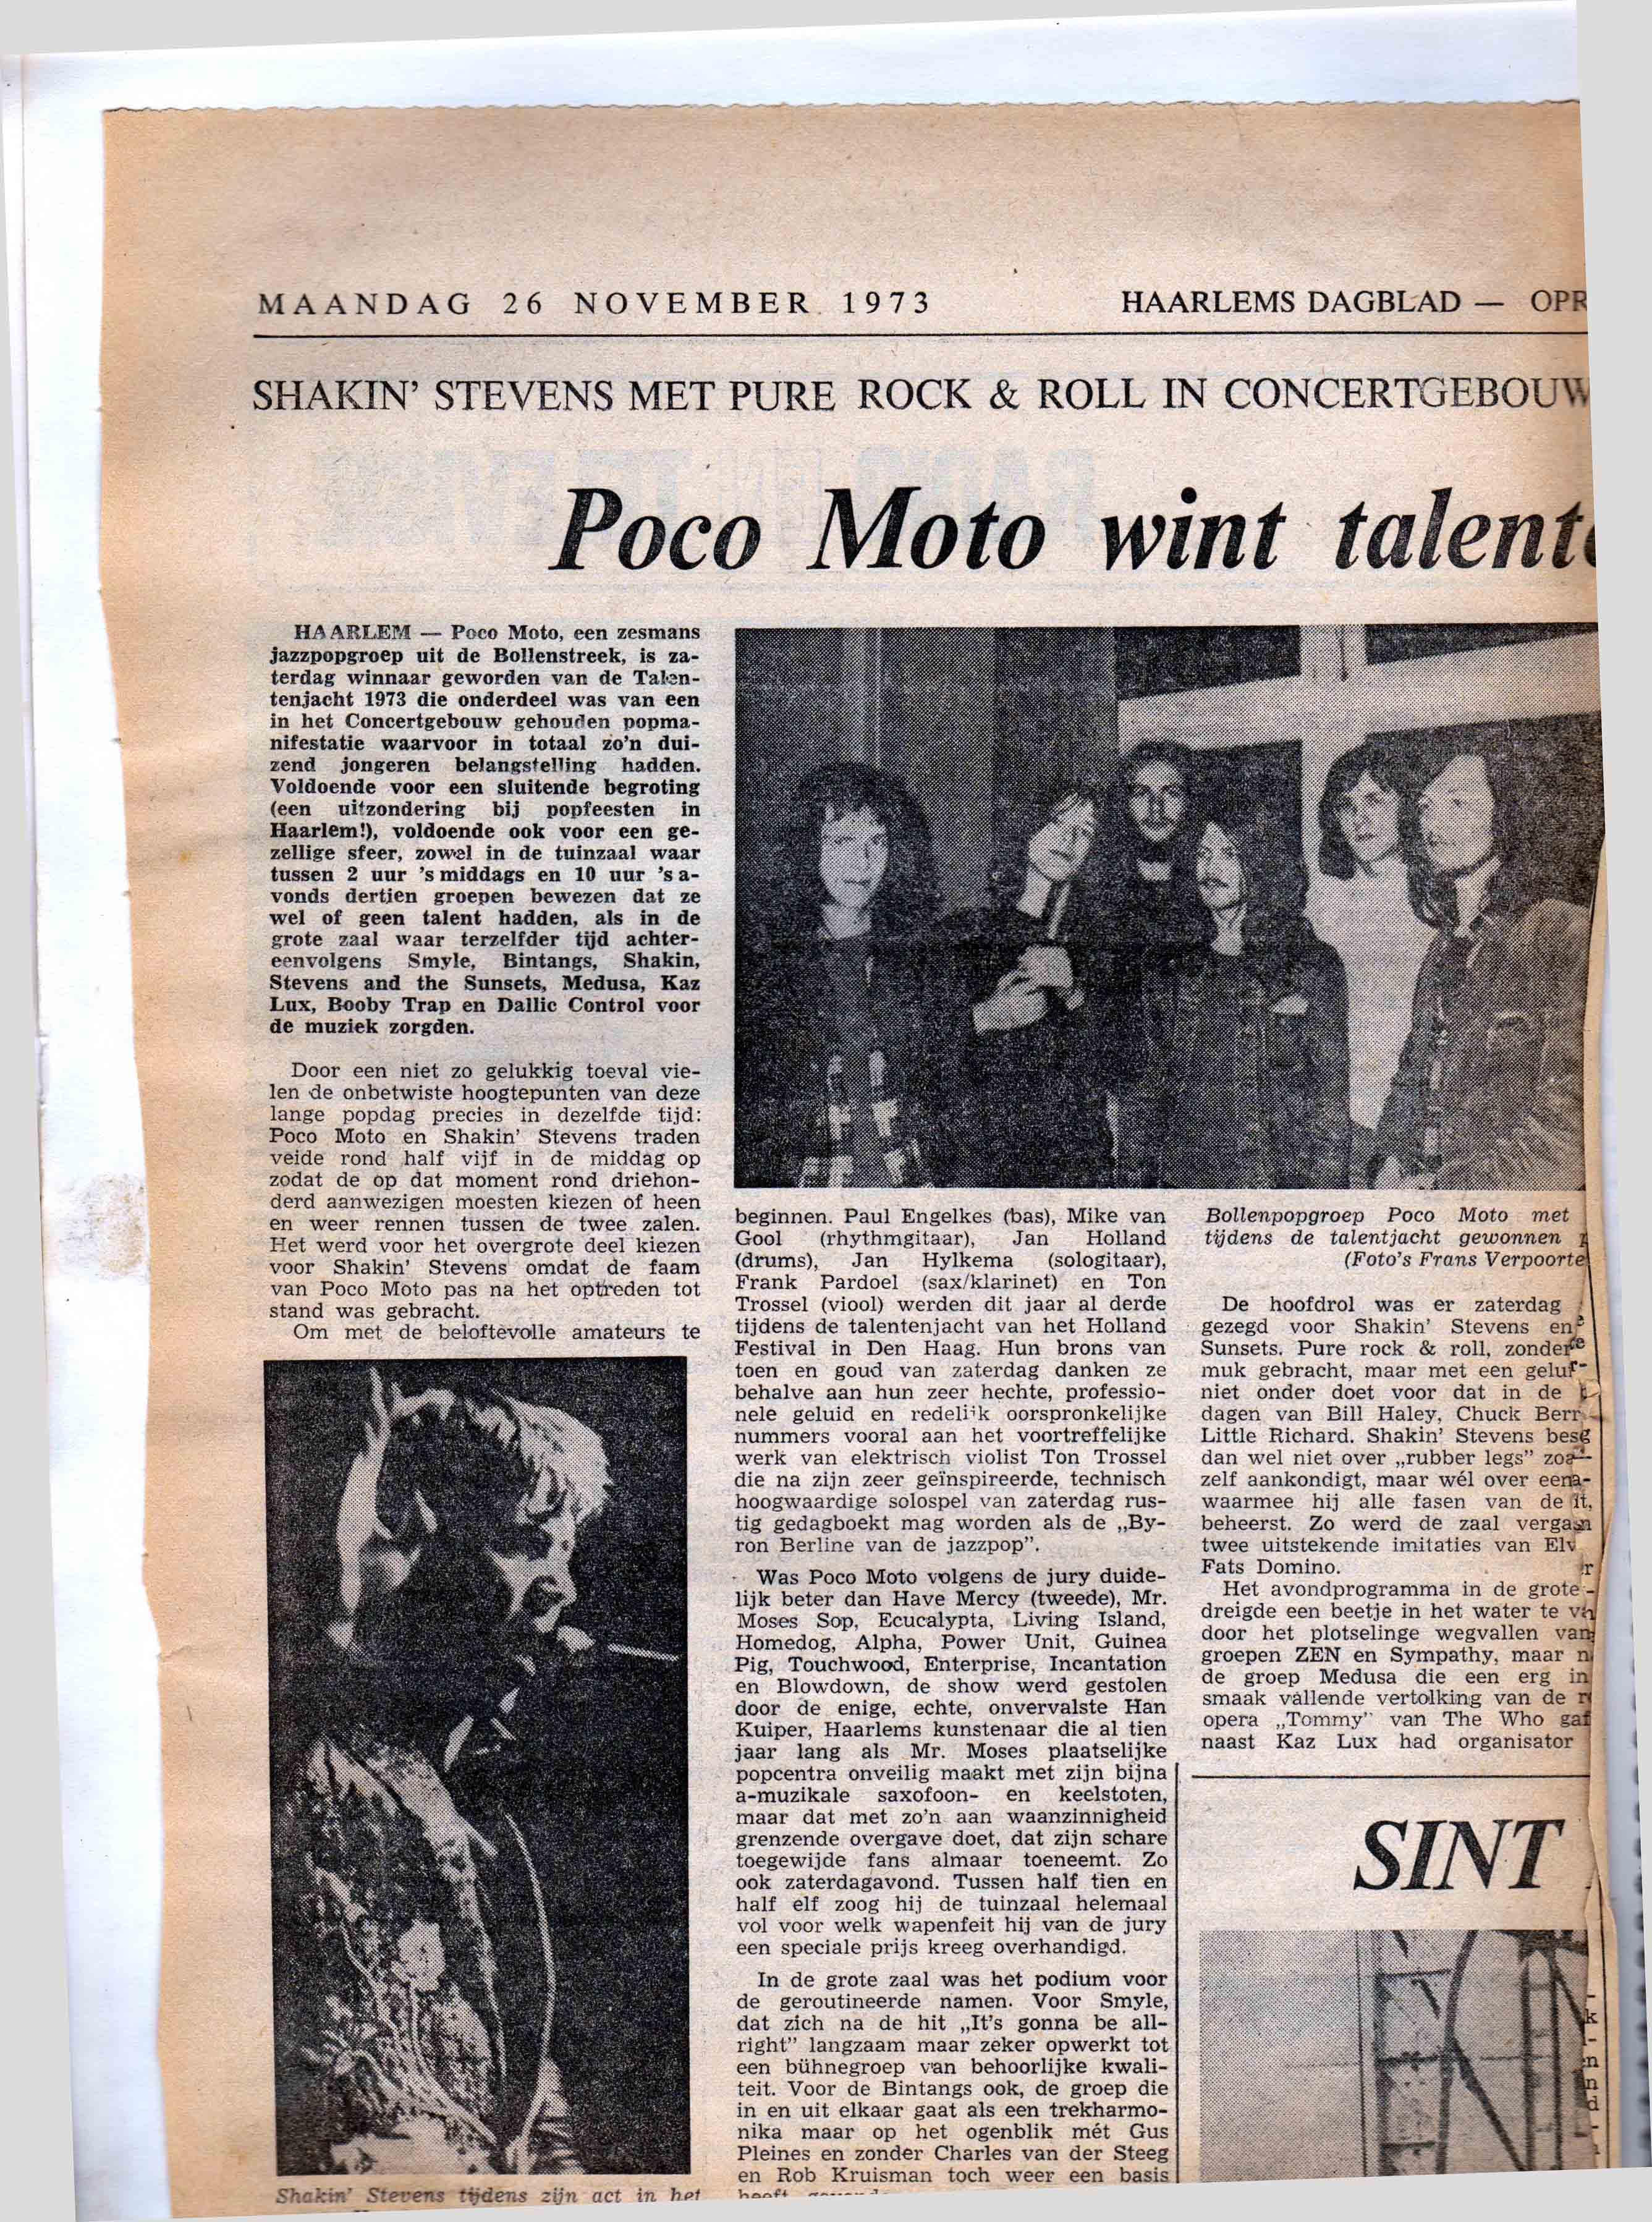 Haarlems Dagblad Poco Moto Winnaars talentenjacht Haarlem 1973